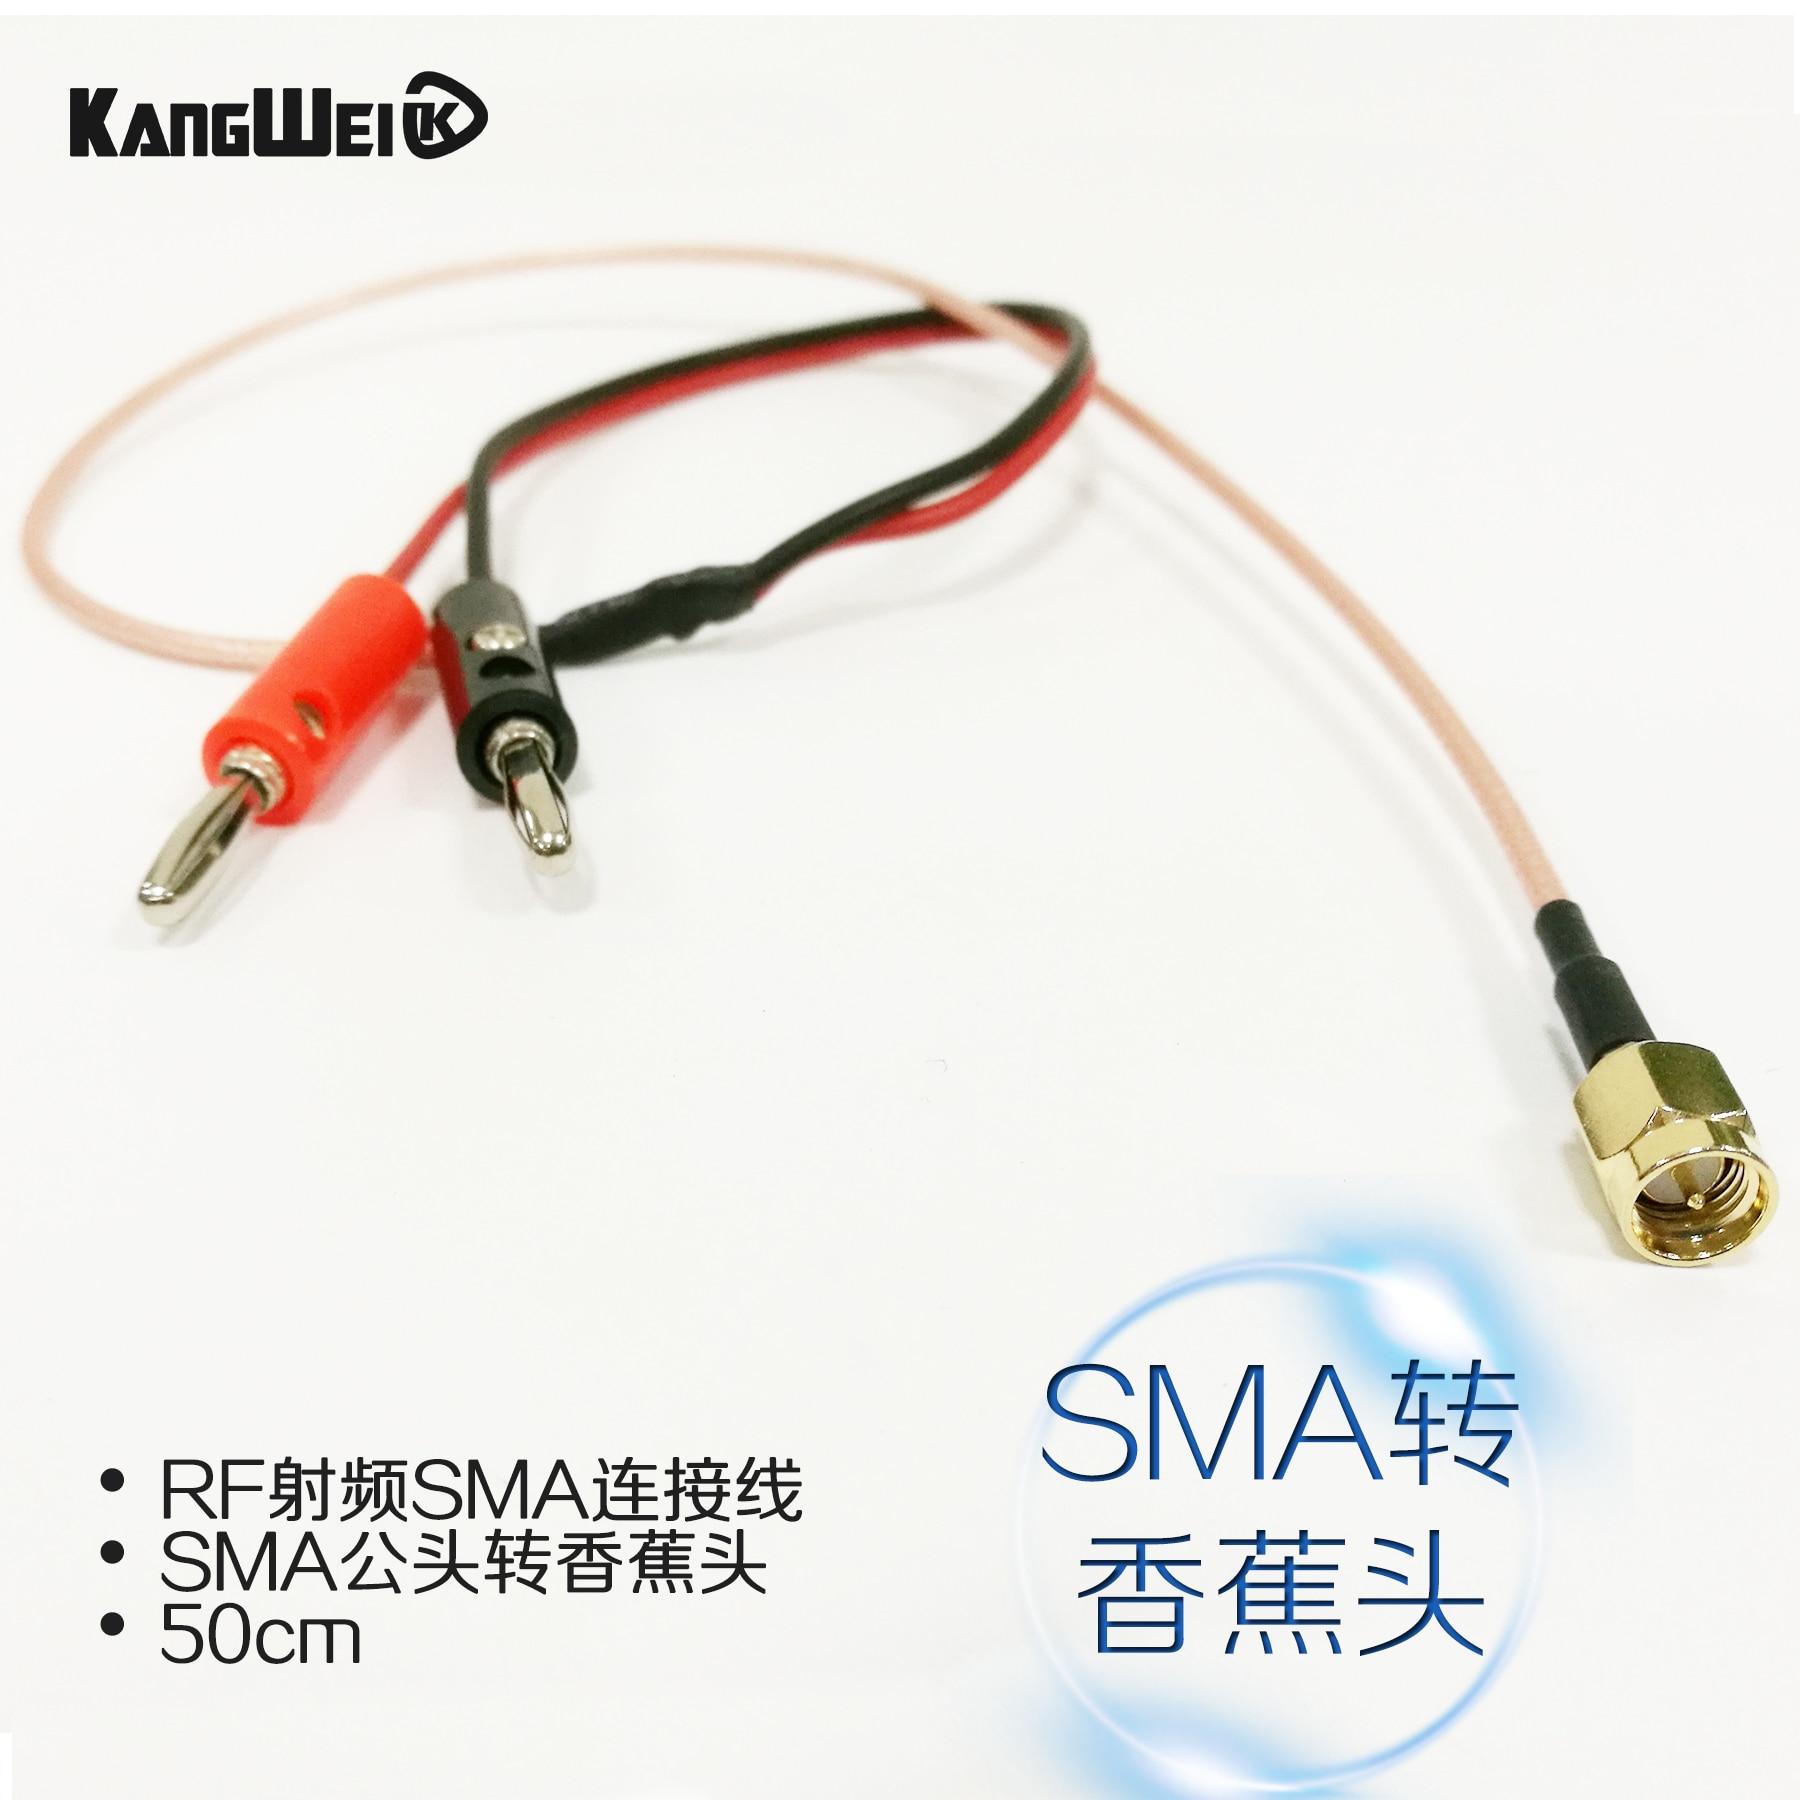 SMA banana head connection line, RF radio frequency SMA connection line SMA, male head turn banana head, 50cm long line [lan] gore okr01r71024 0 sma sma rf test line revolution angle 18ghz 60cm